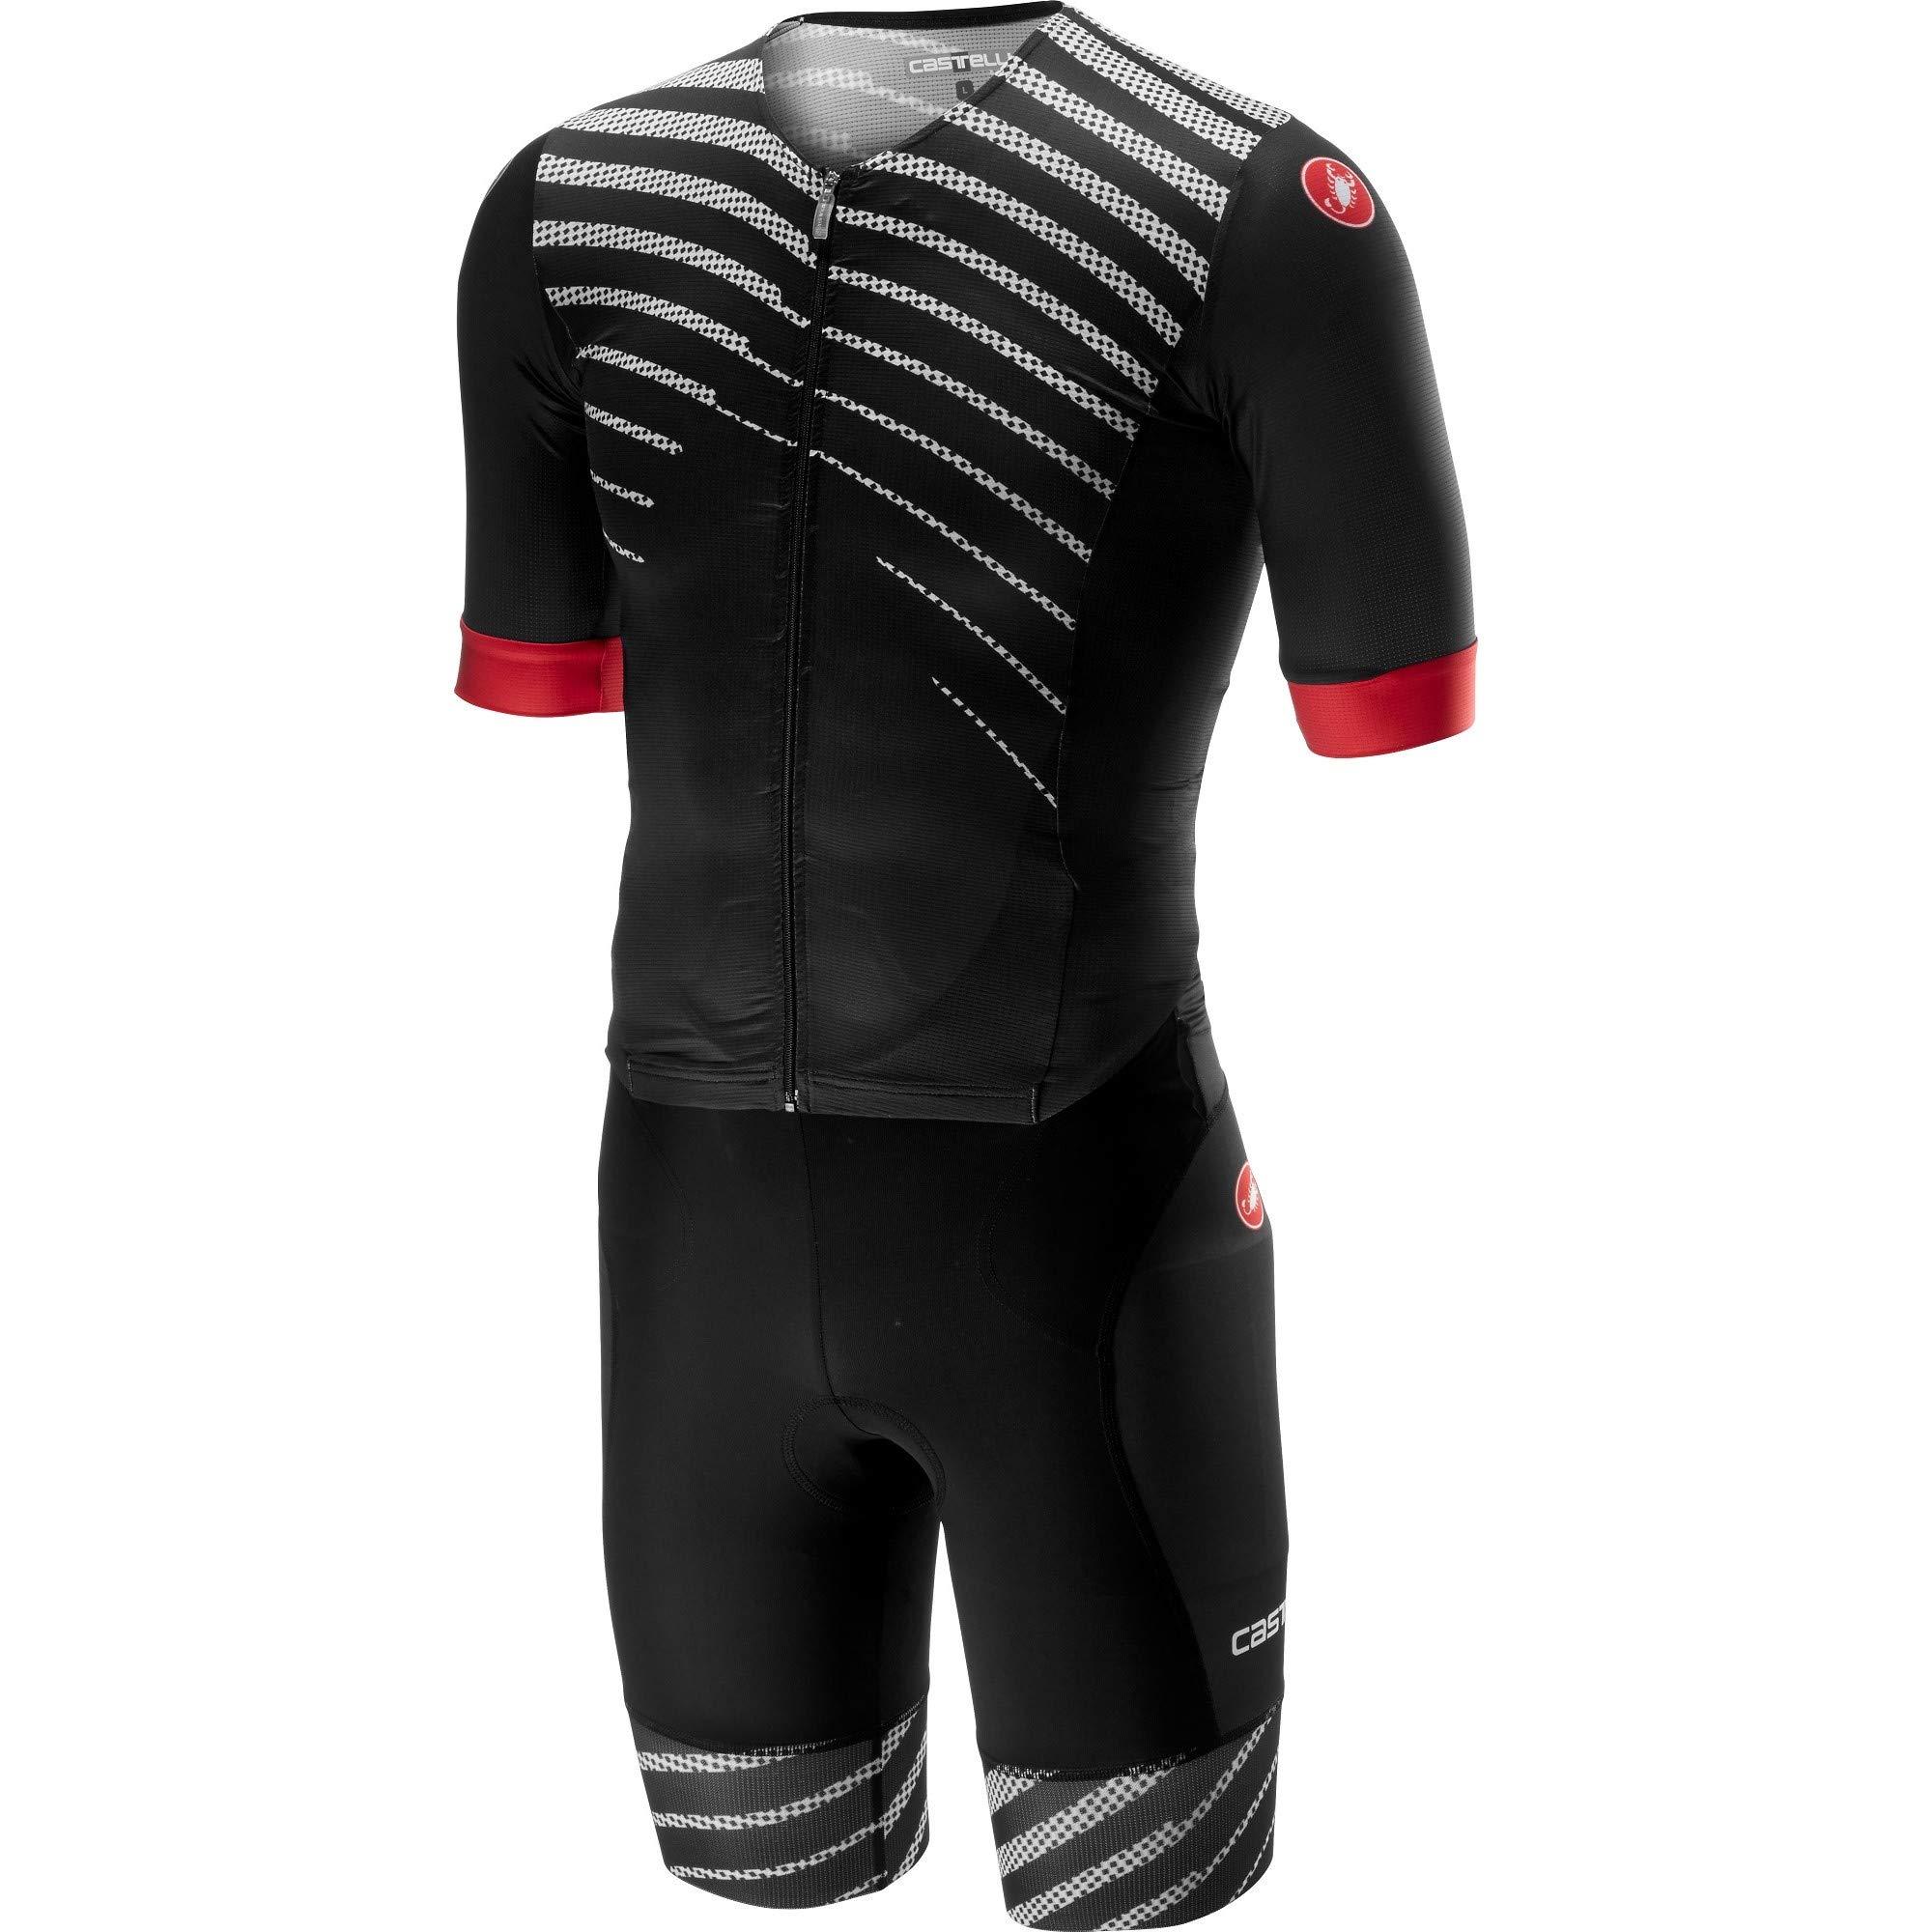 Castelli Men's Free Sanremo Short Sleeve Tri Suit (Black/Black, Small)